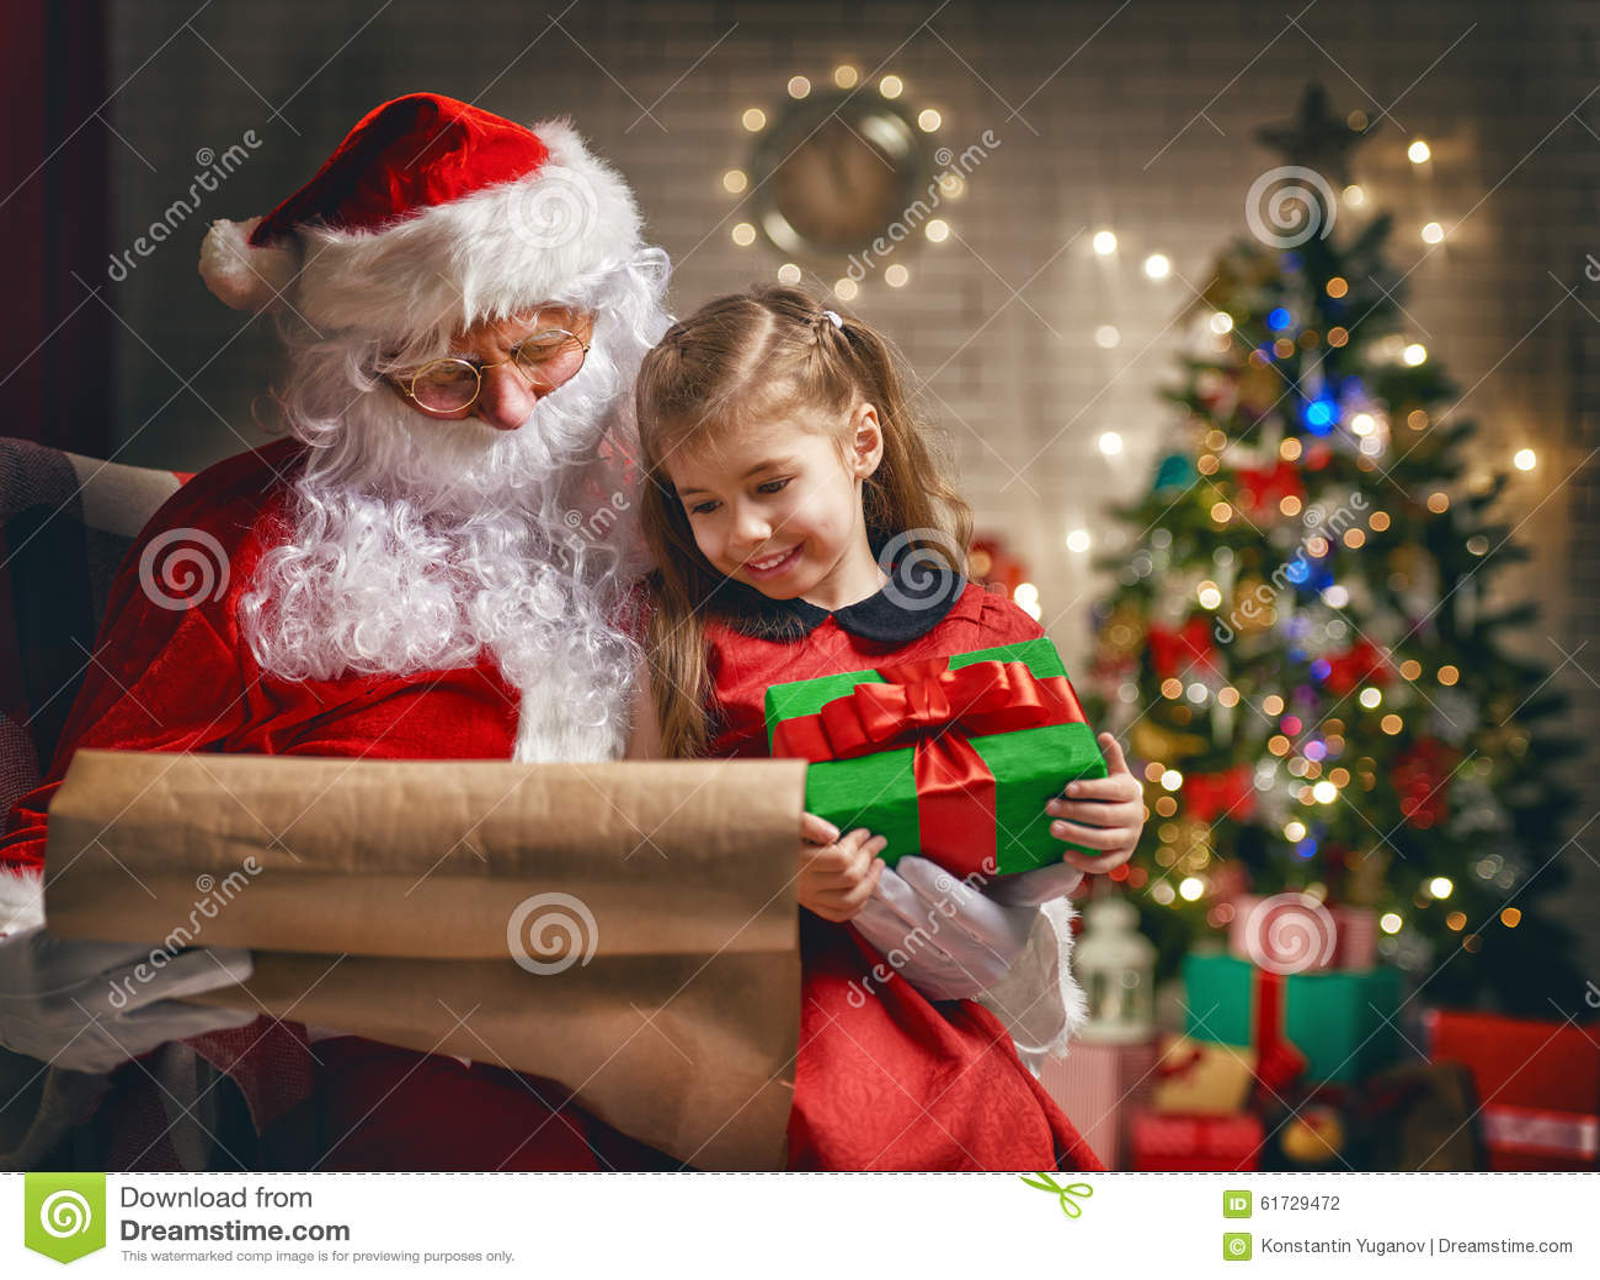 santa claus and little girl decorated home - Santa Santa Claus